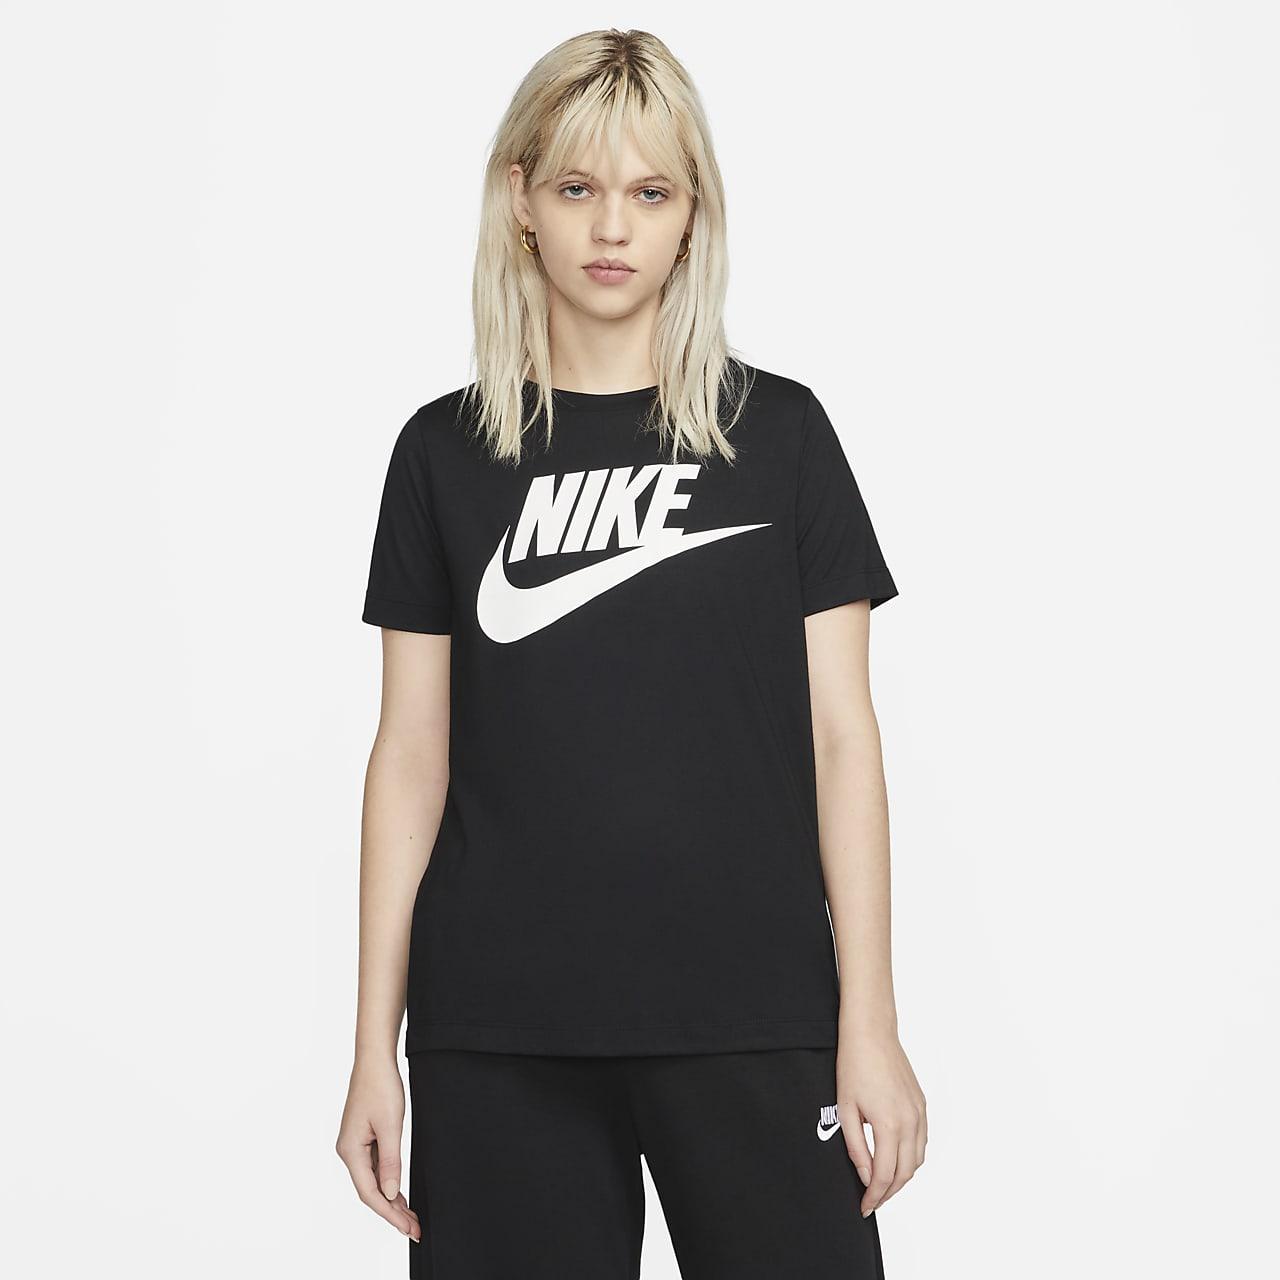 nike shirts damen günstig